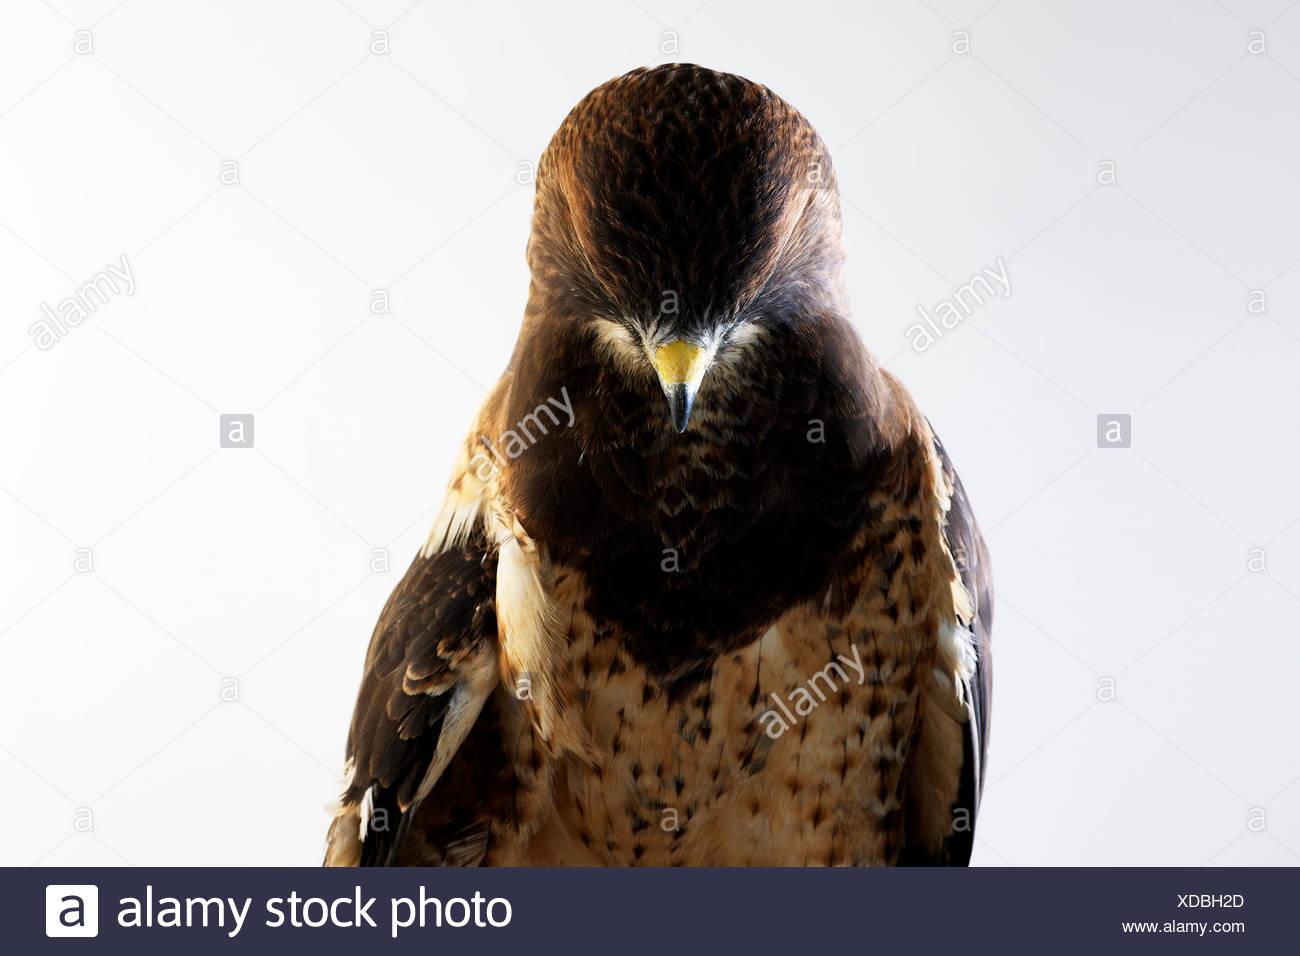 A studio portrait of a shy Swainson's Hawk (Buteo swainsoni). - Stock Image